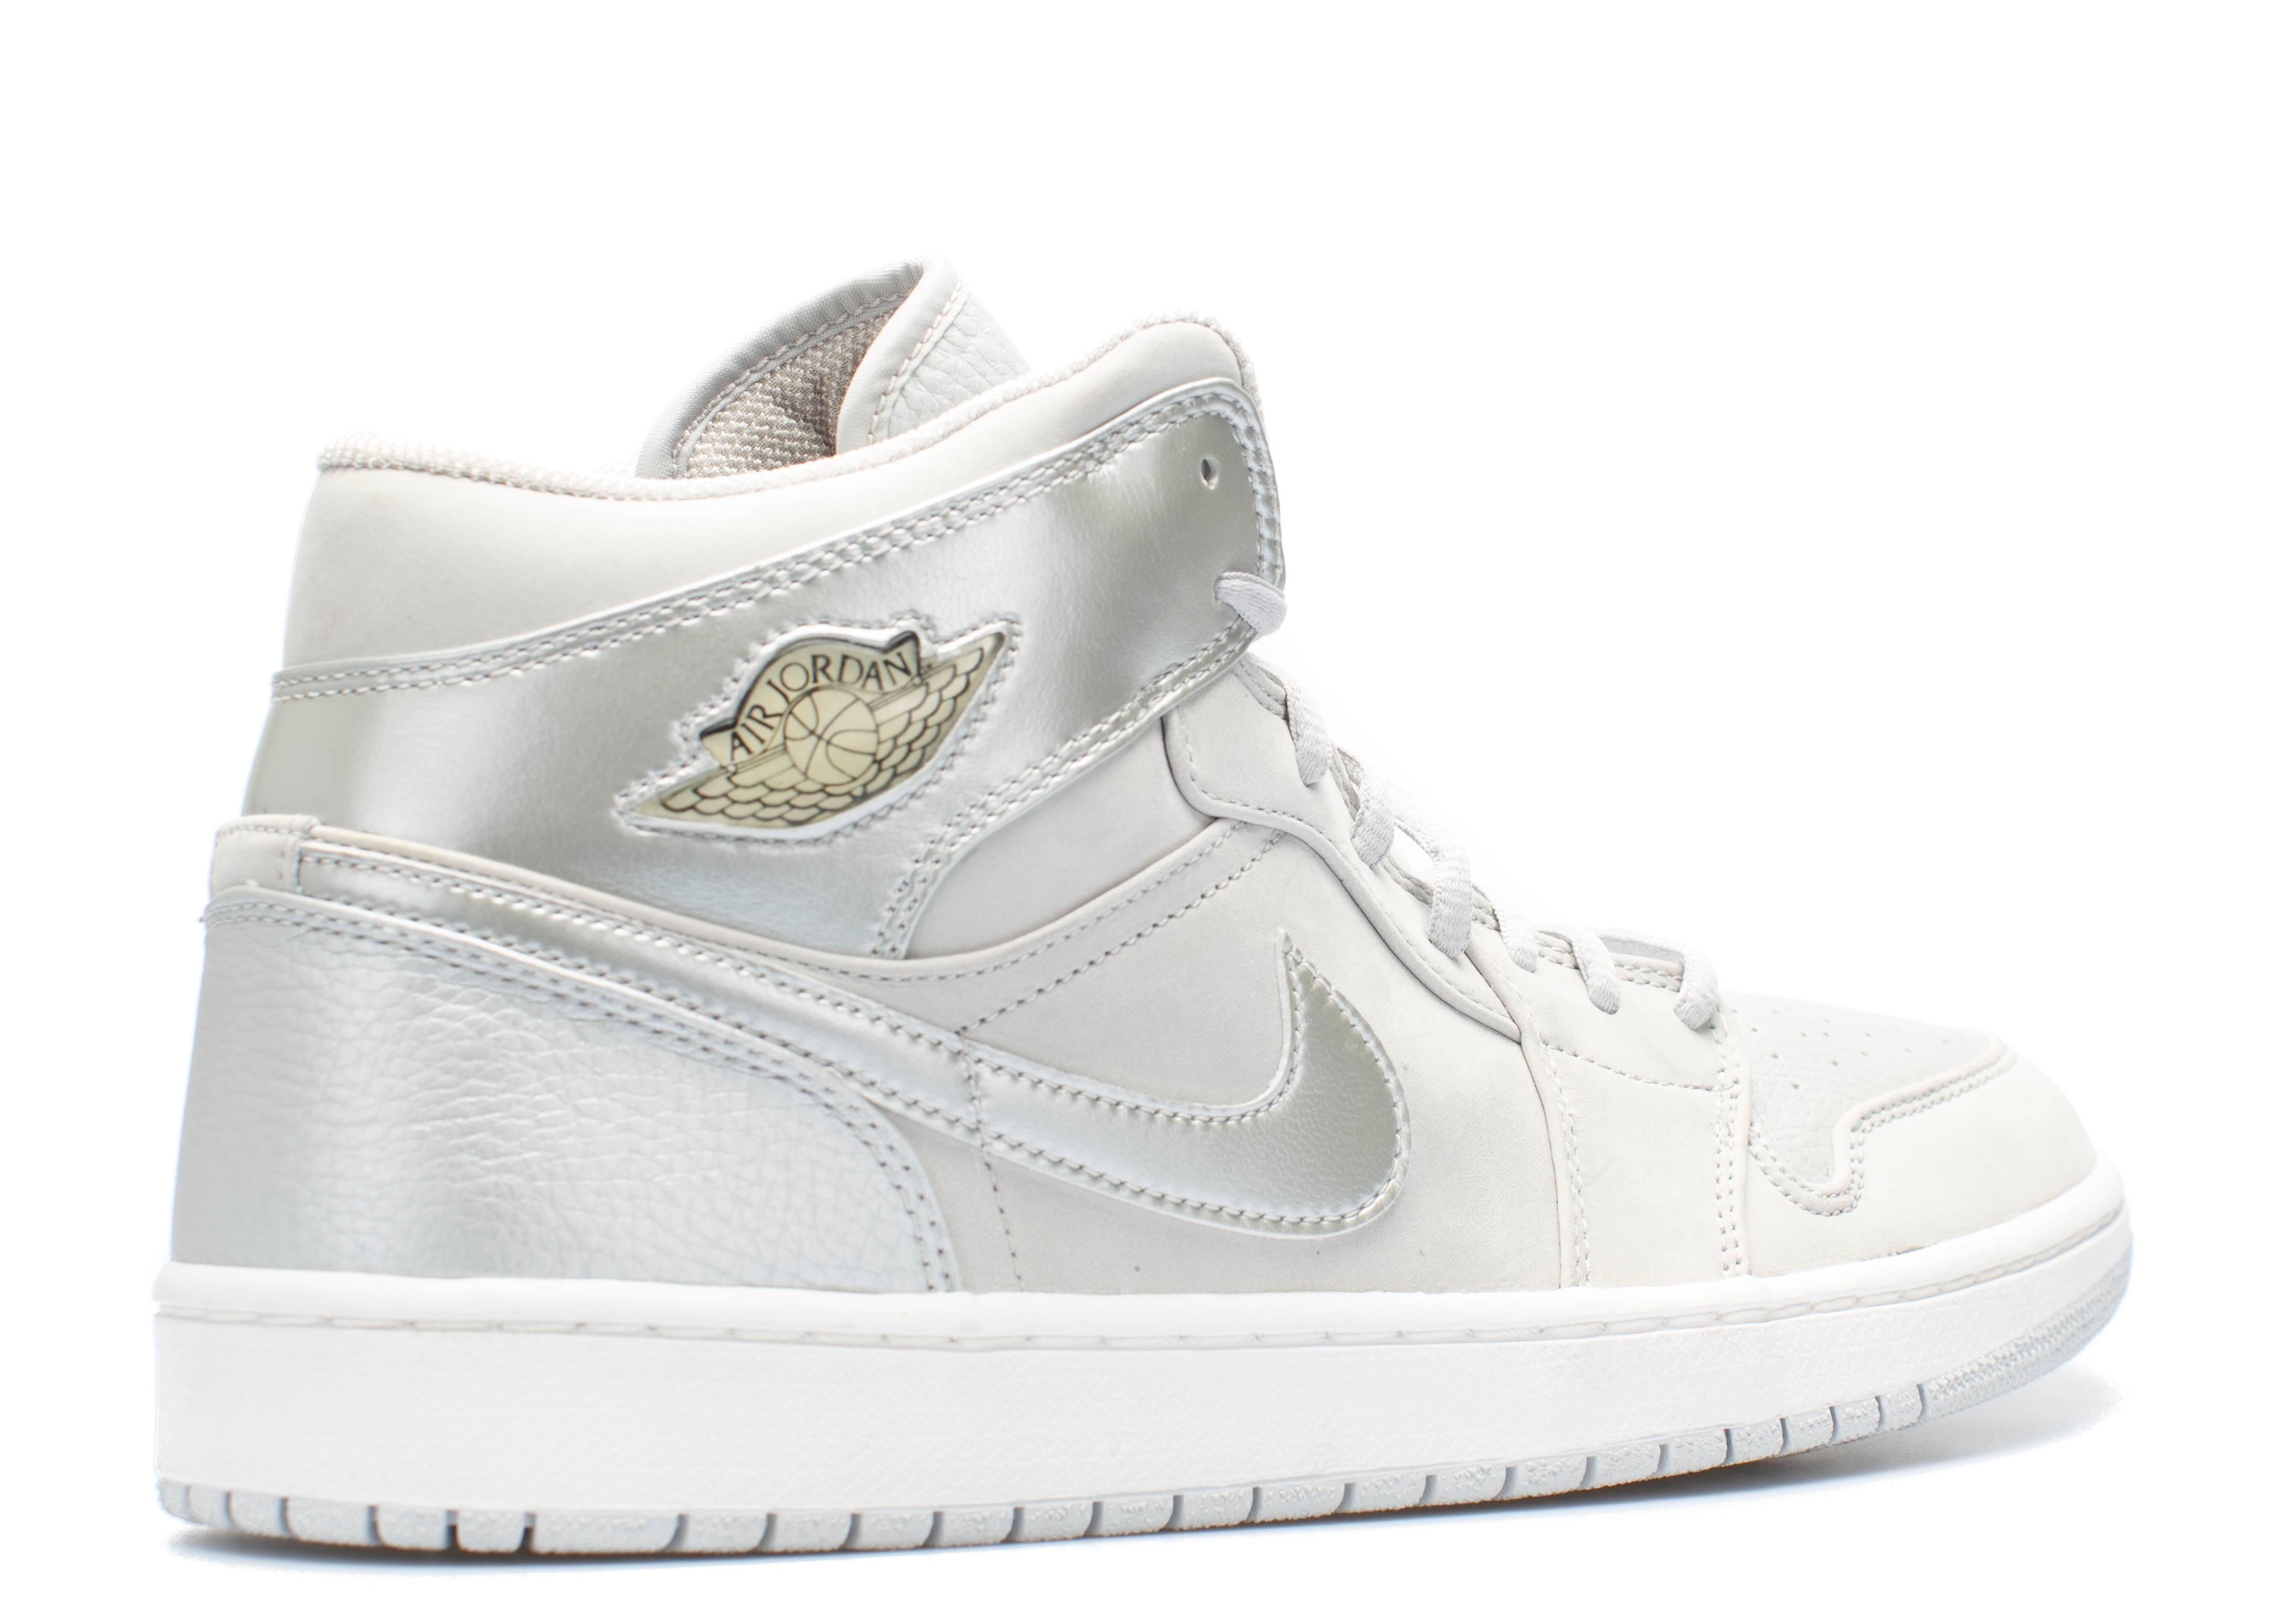 Air Jordan 1 Metallic Silver